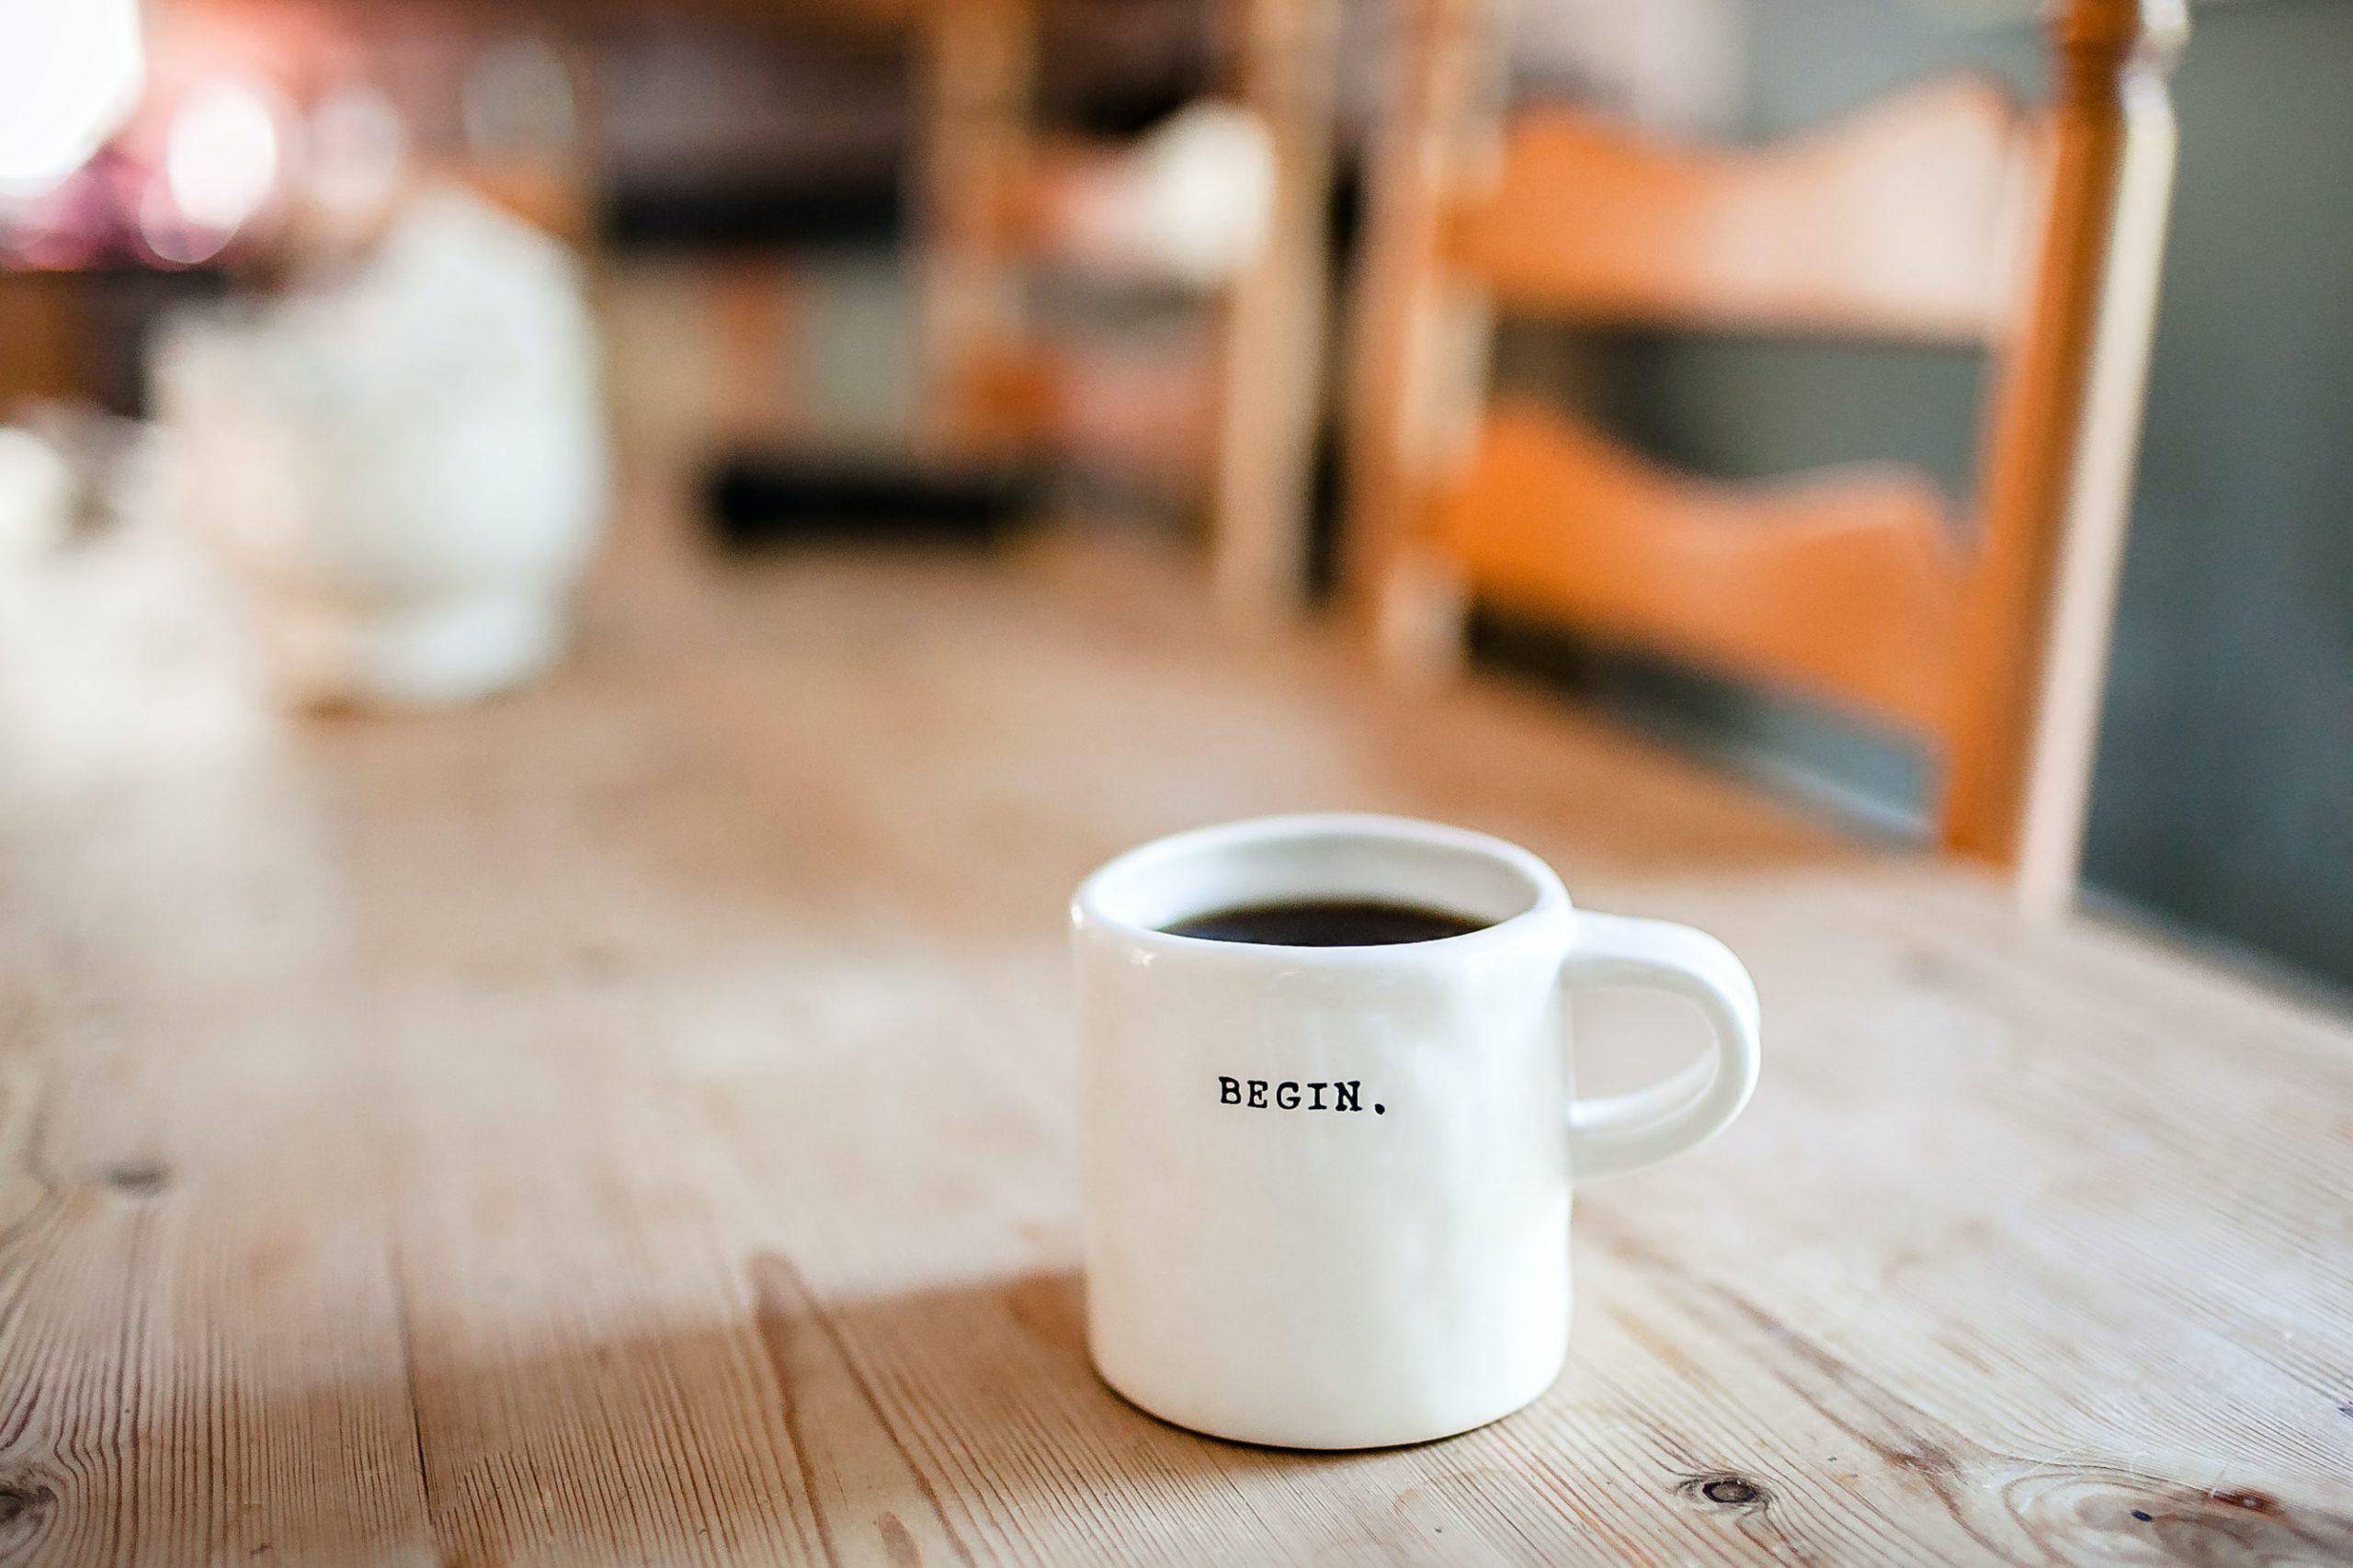 The word begin on a mug. symbolizes social entrepreneurship.